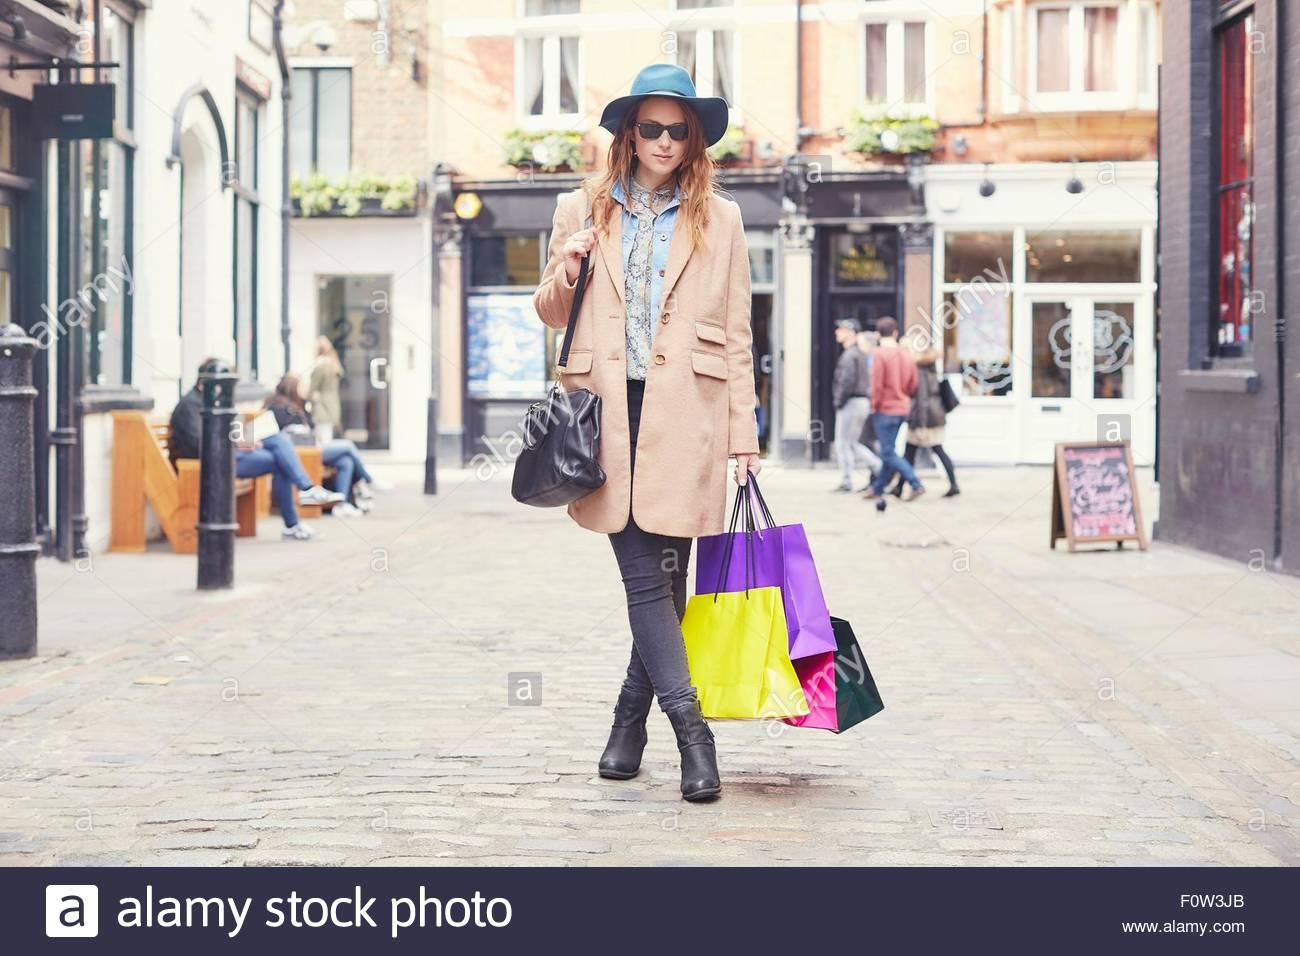 Portrait of stylish young woman on shopping spree, London, UK - Stock Image